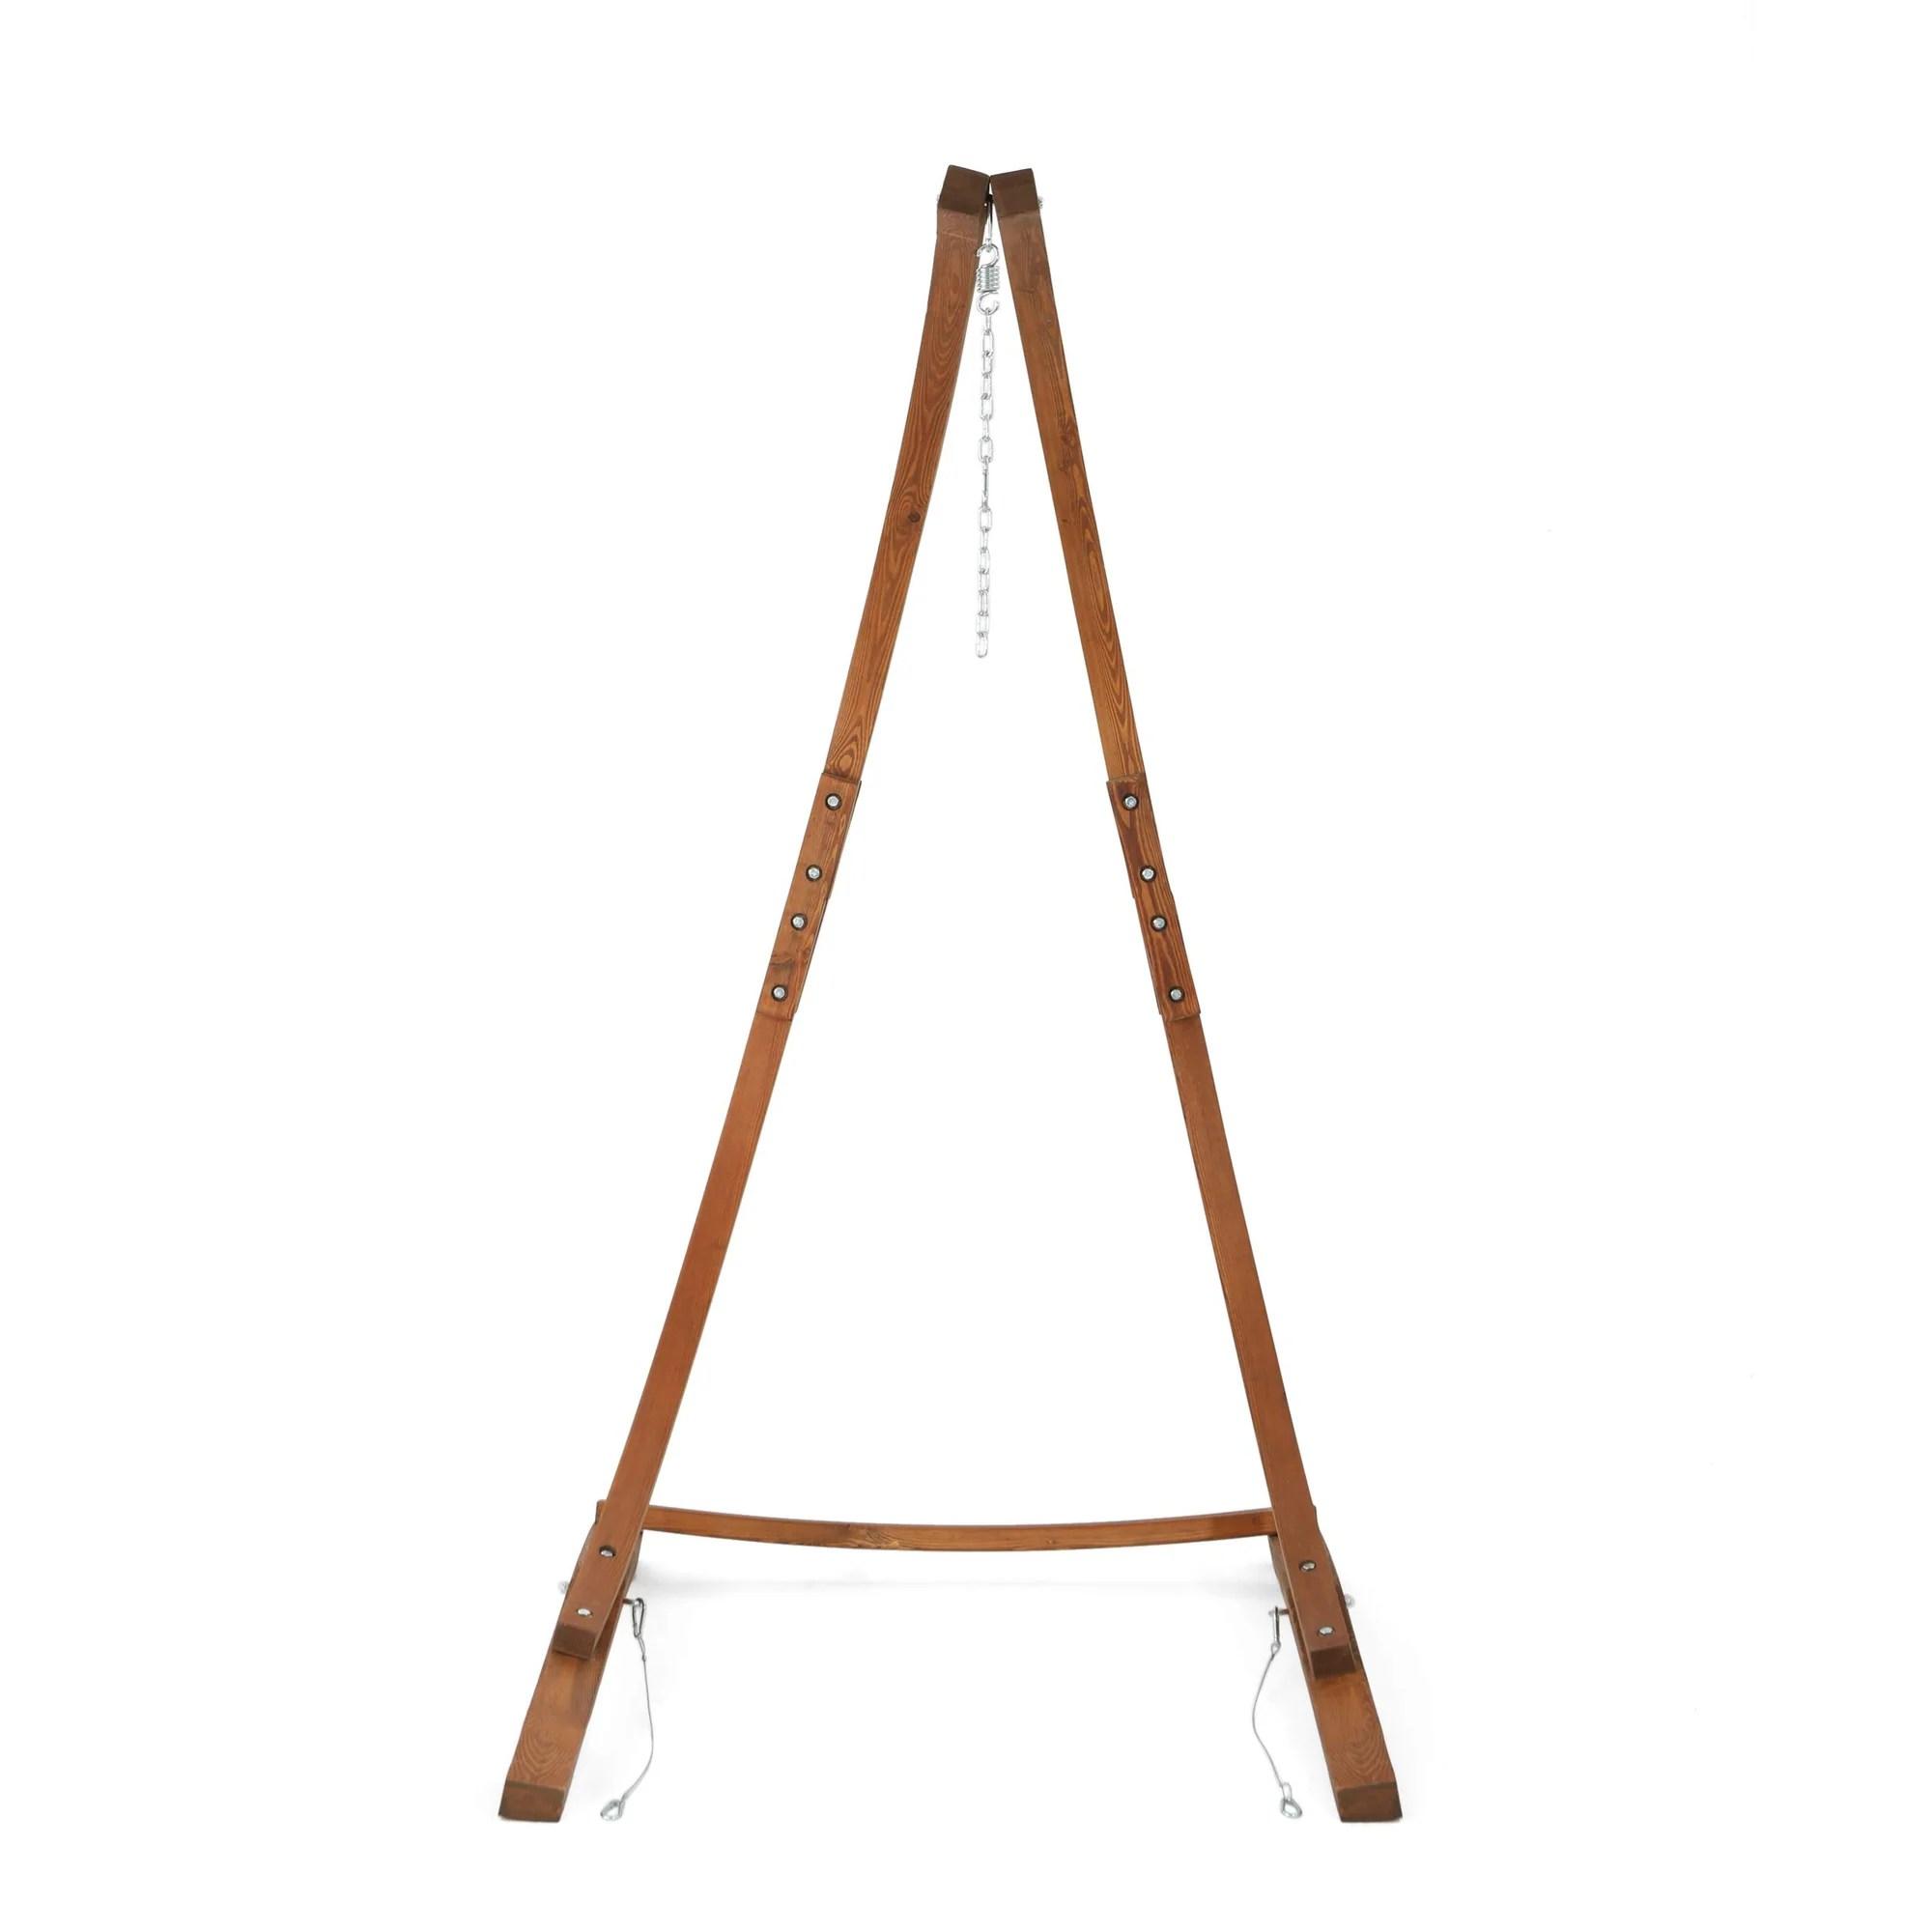 Teak Finish Larch Wood Hammock Chair Stand